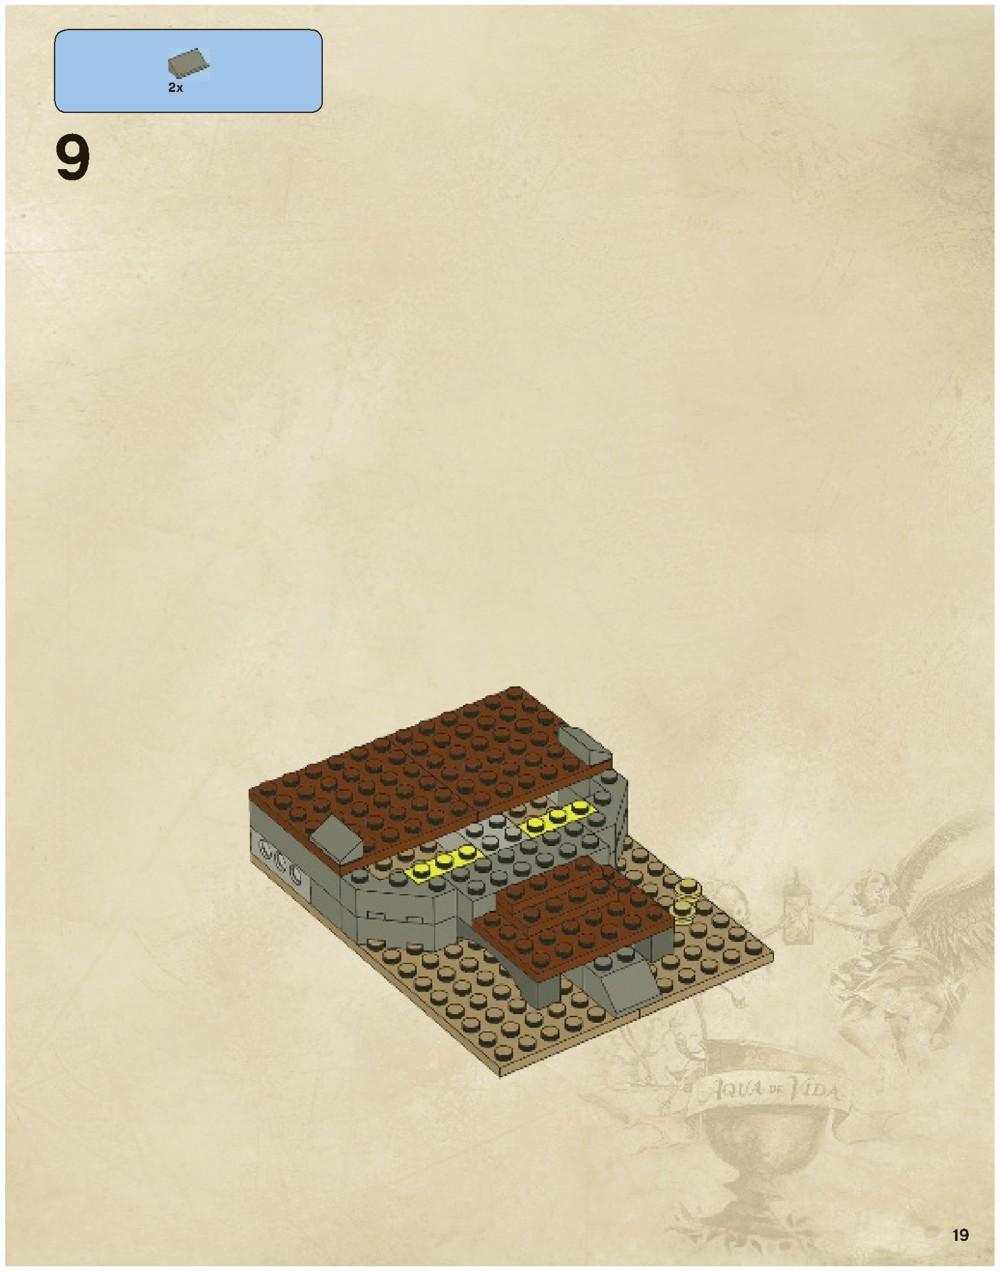 lego pirates of the caribbean whitecap bay instructions